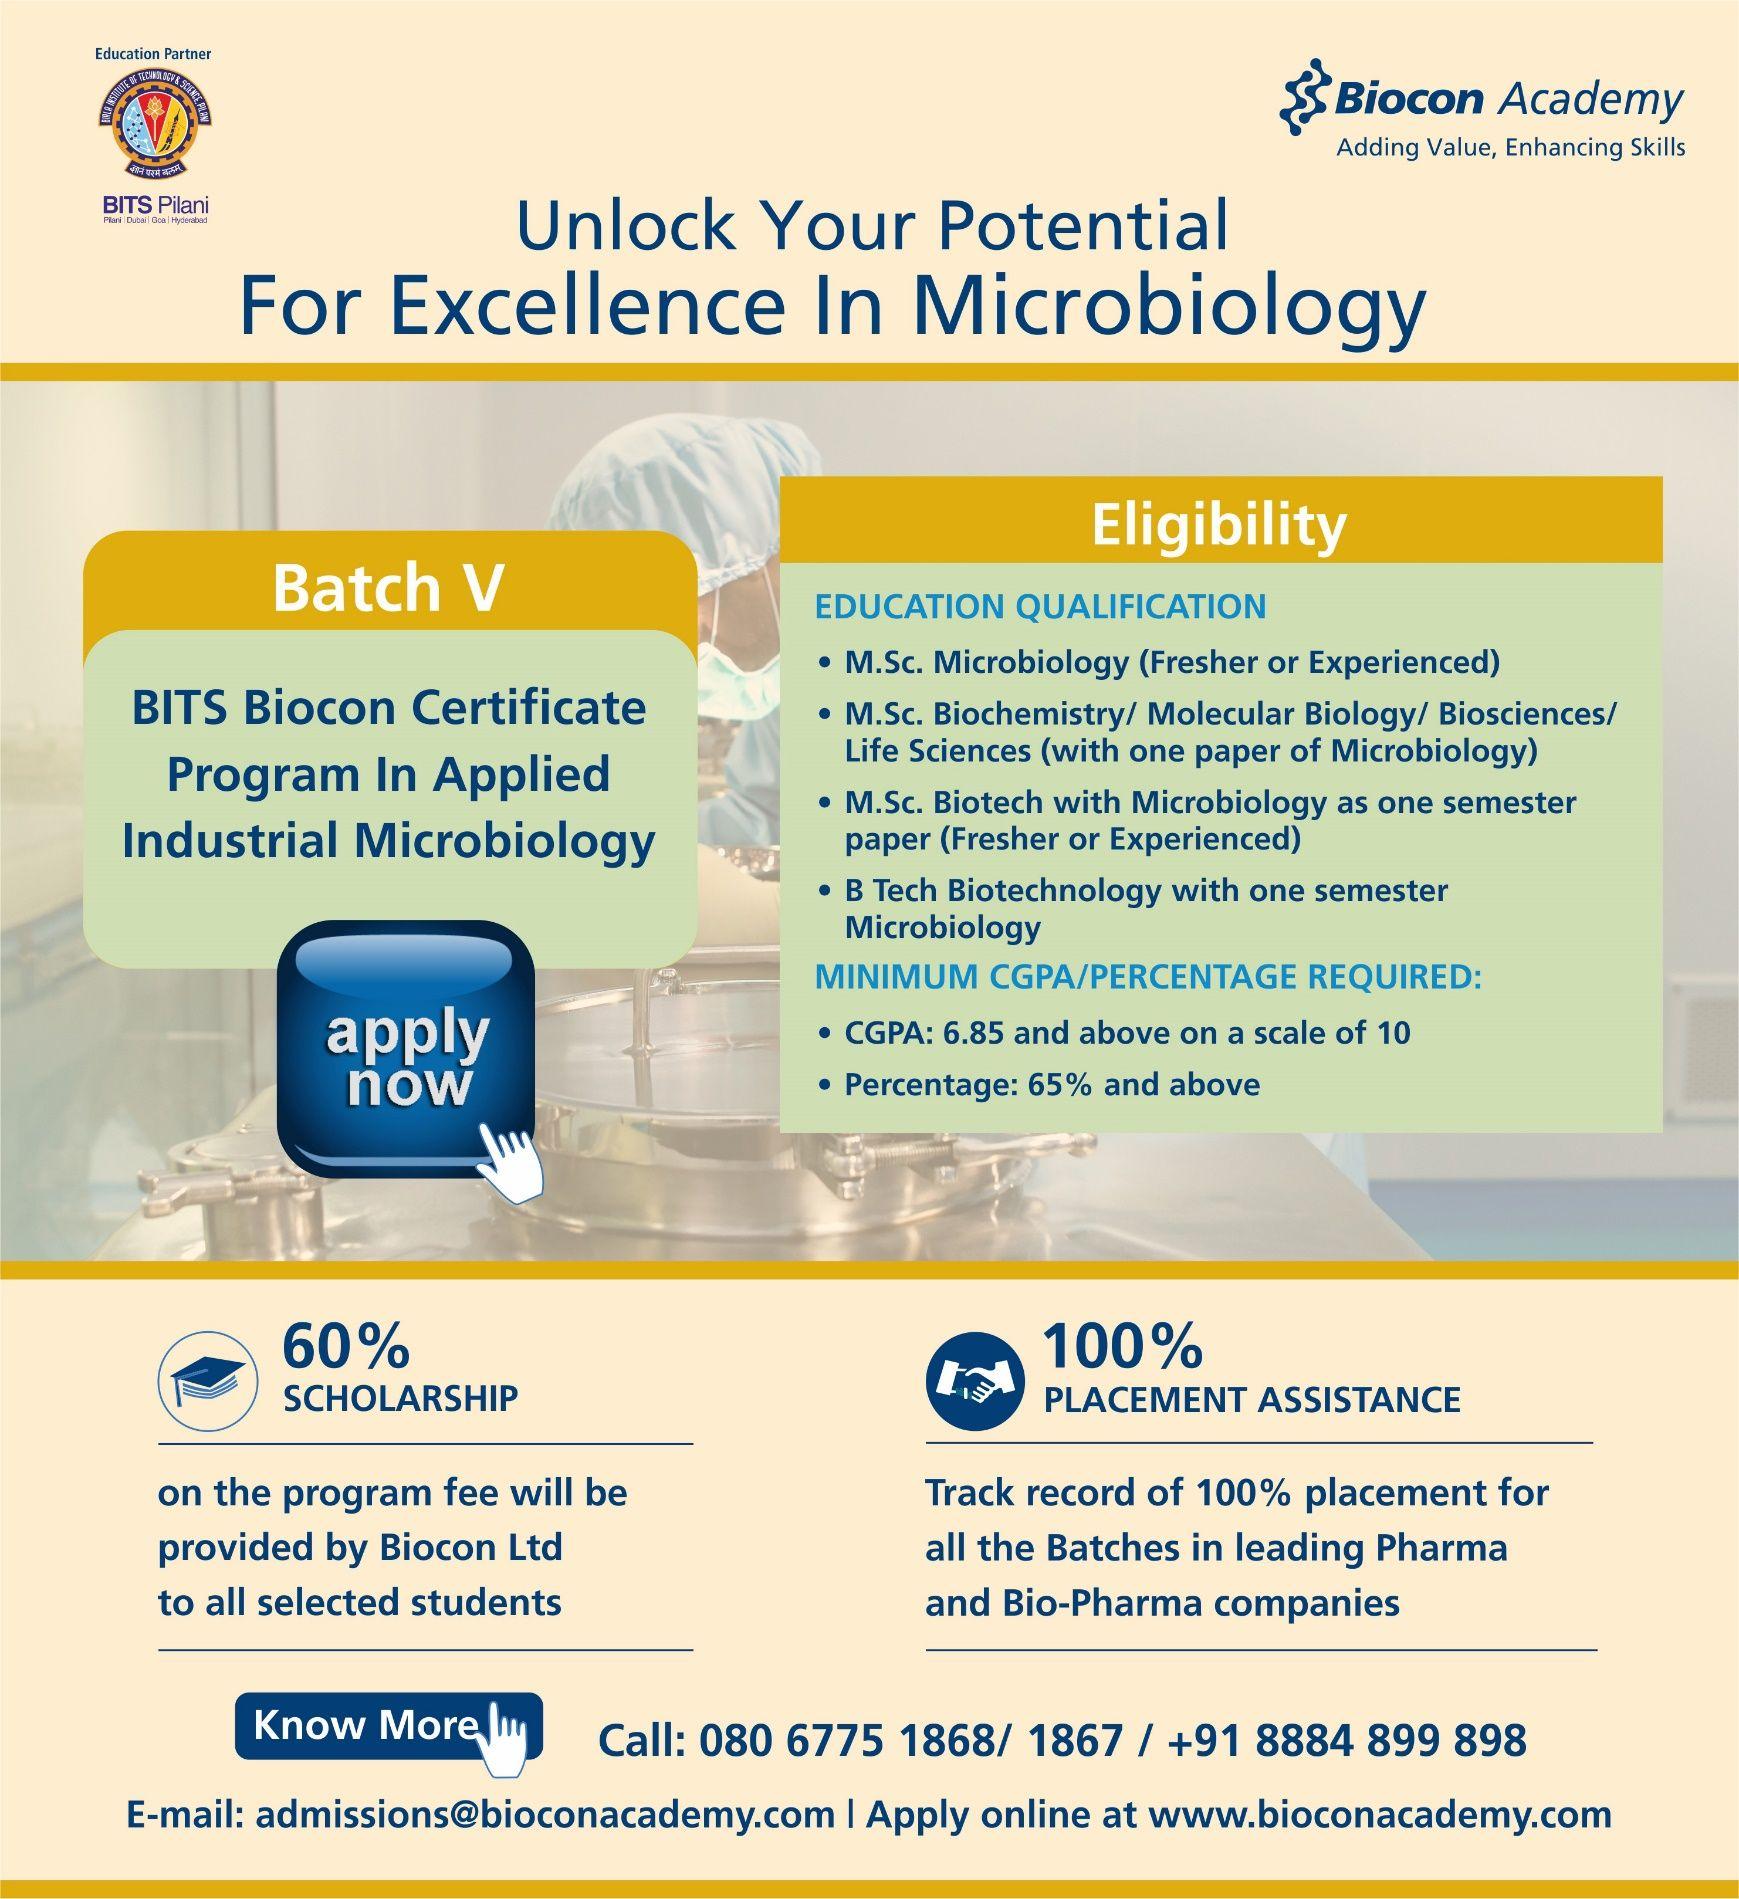 Pin By Biochem Adda On Biotech Internships Biochemistry Microbiology Internship